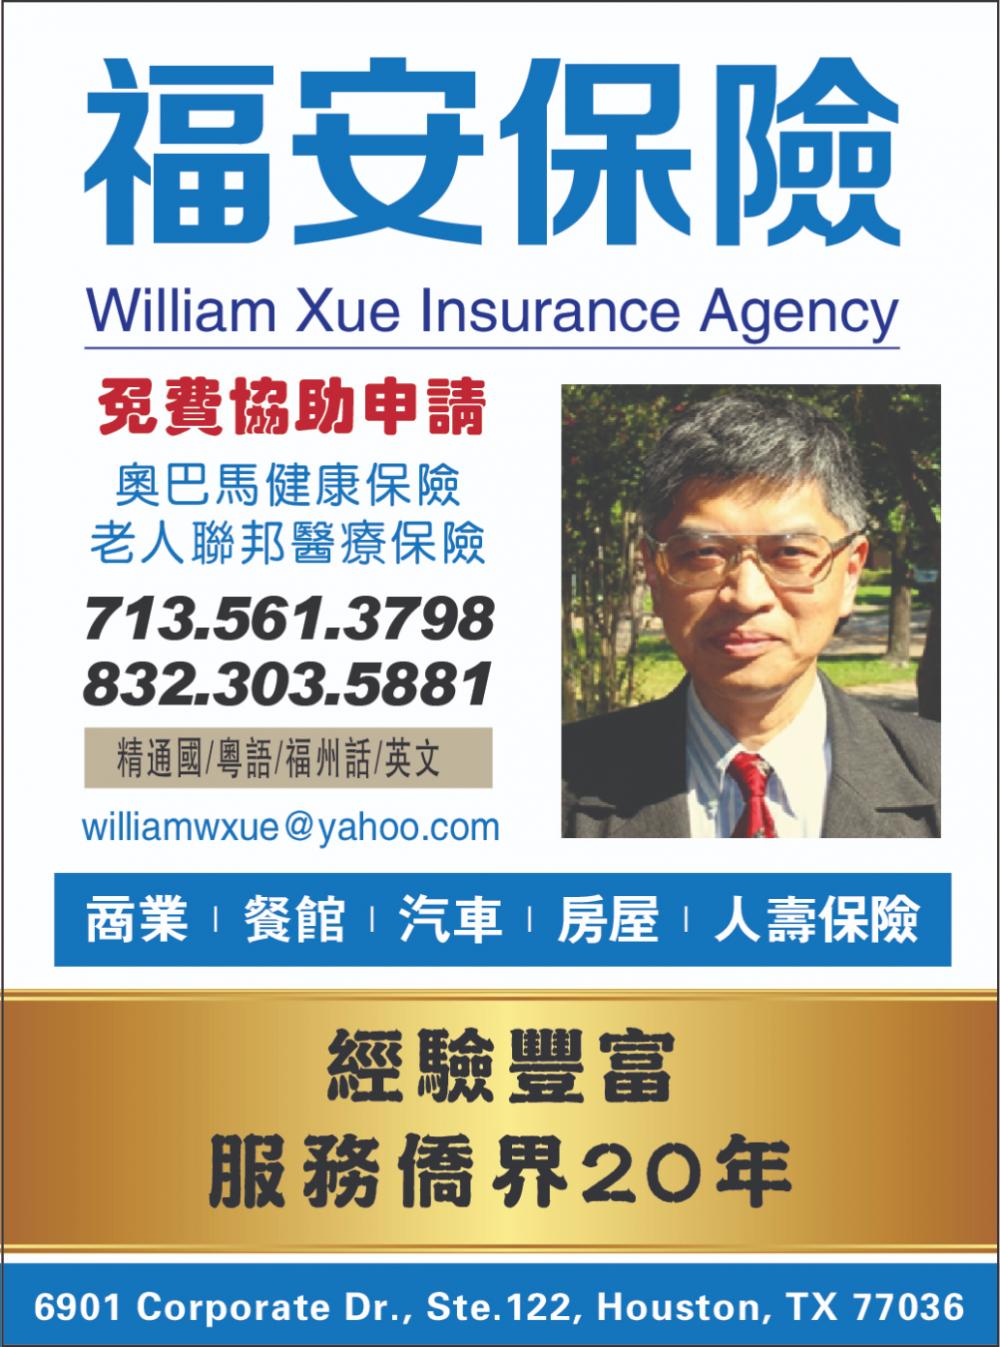 William Xue Insurance Agency福安保险